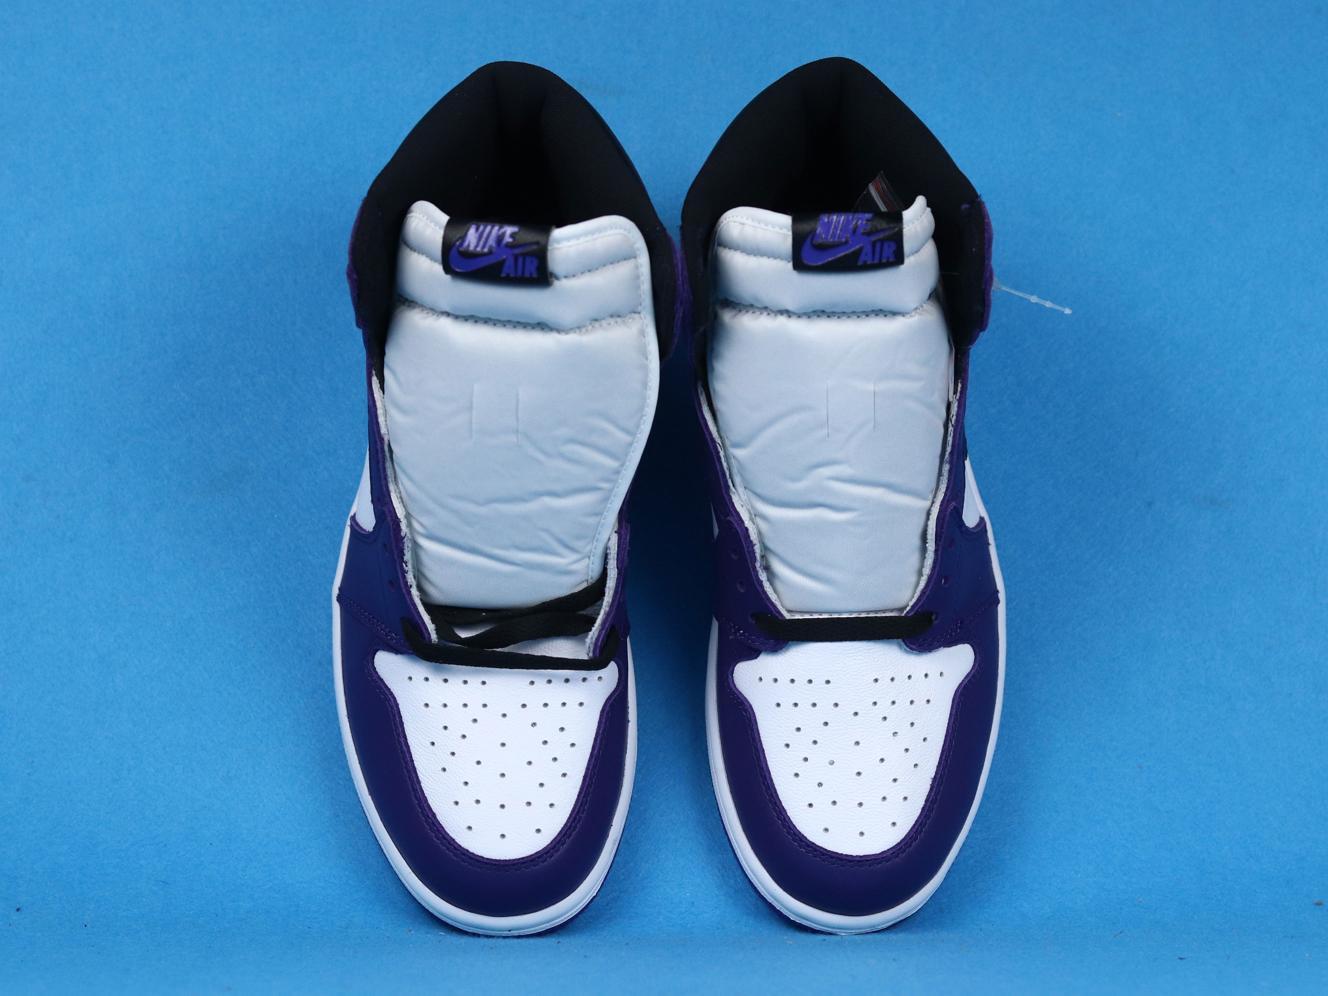 Air Jordan 1 Retro High OG Court Purple 2.0 5